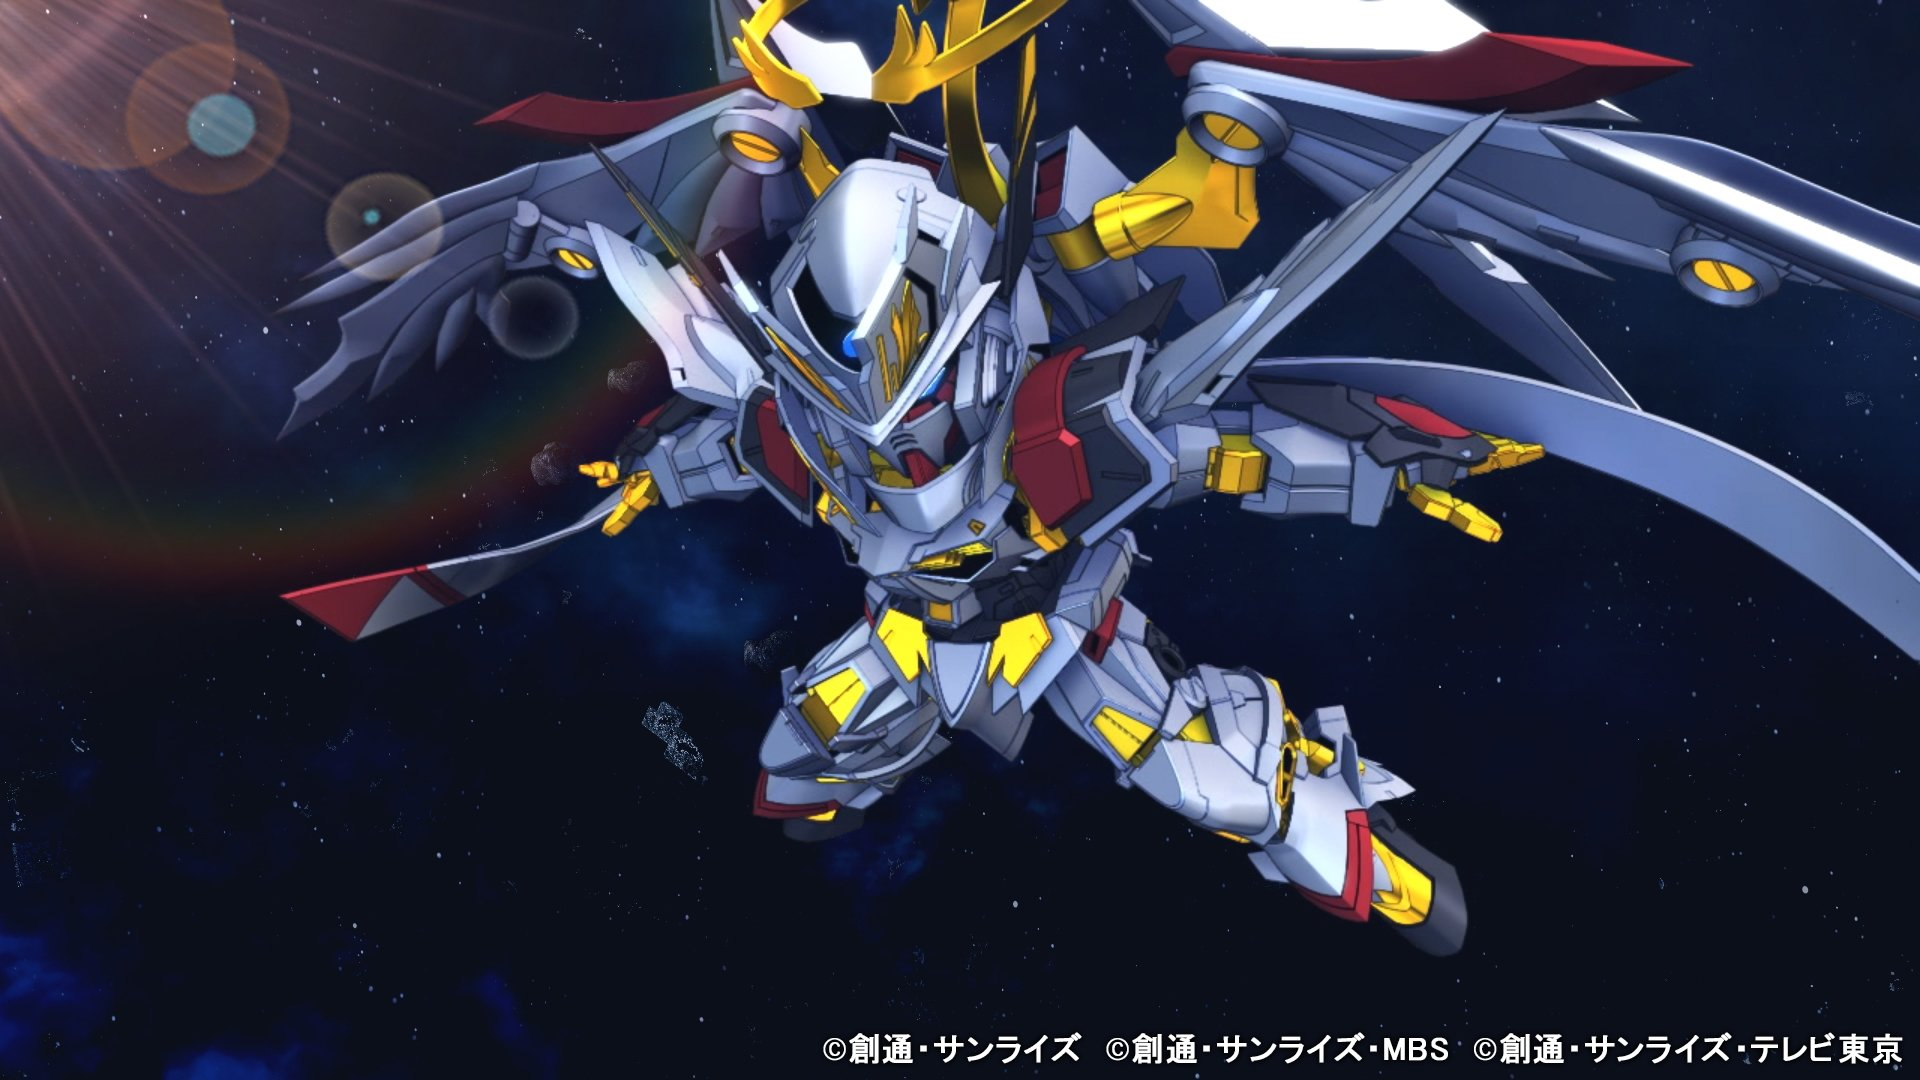 Free DLC is coming to SD Gundam G Generation Cross Rays screenshot